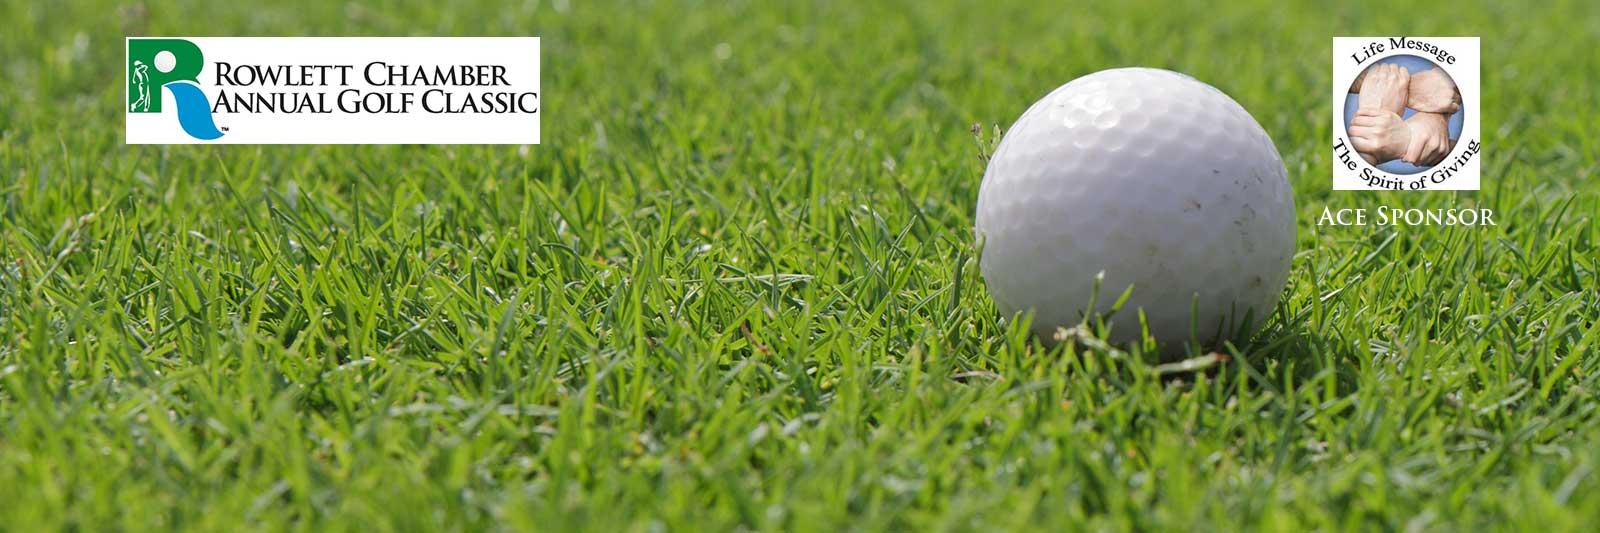 golf-classic-slider.jpg